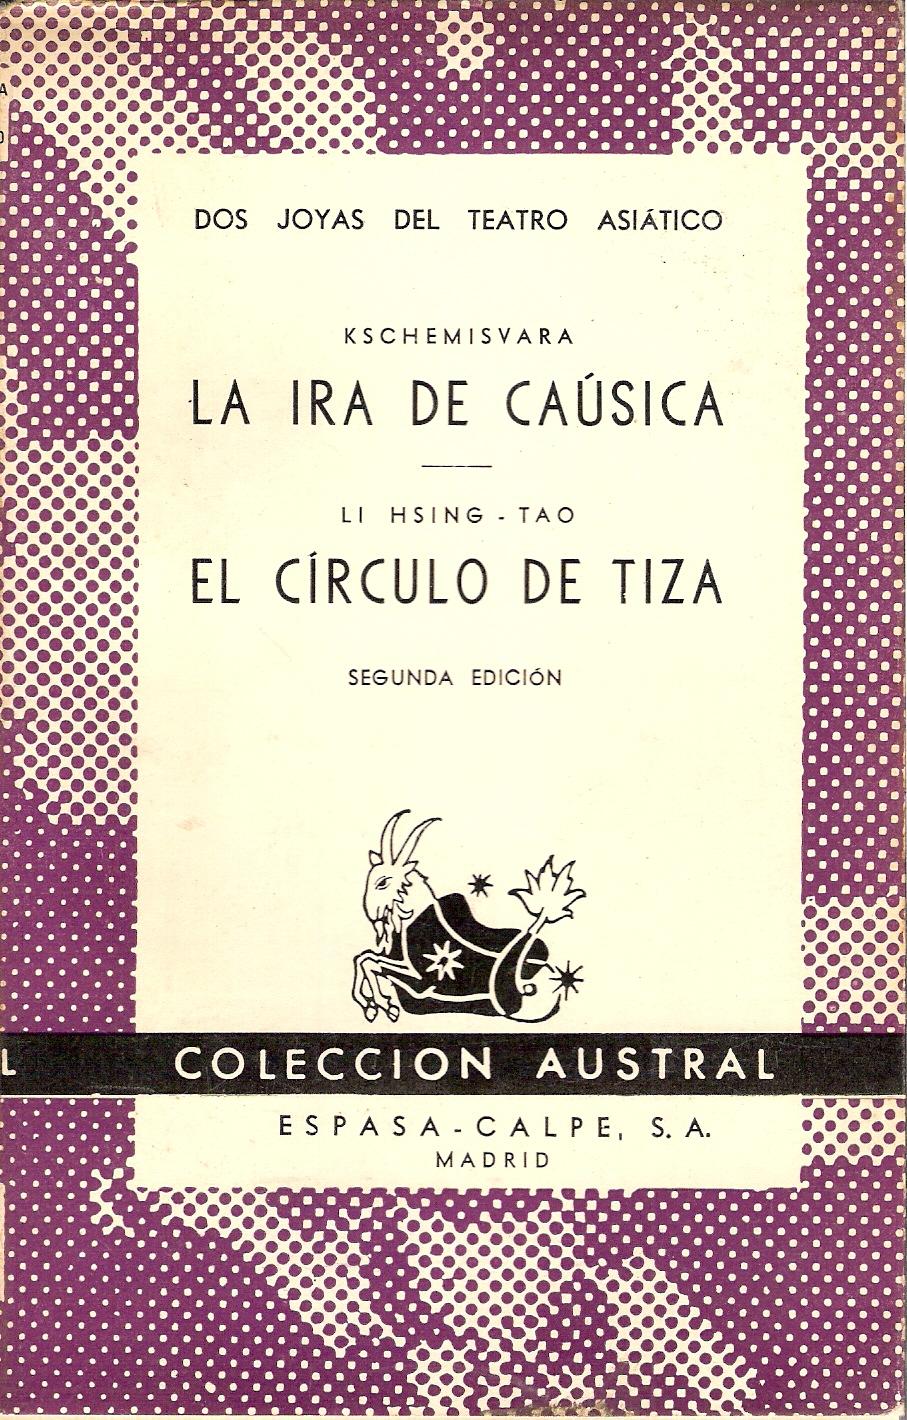 La ira de Caúsica - El círculo de tiza